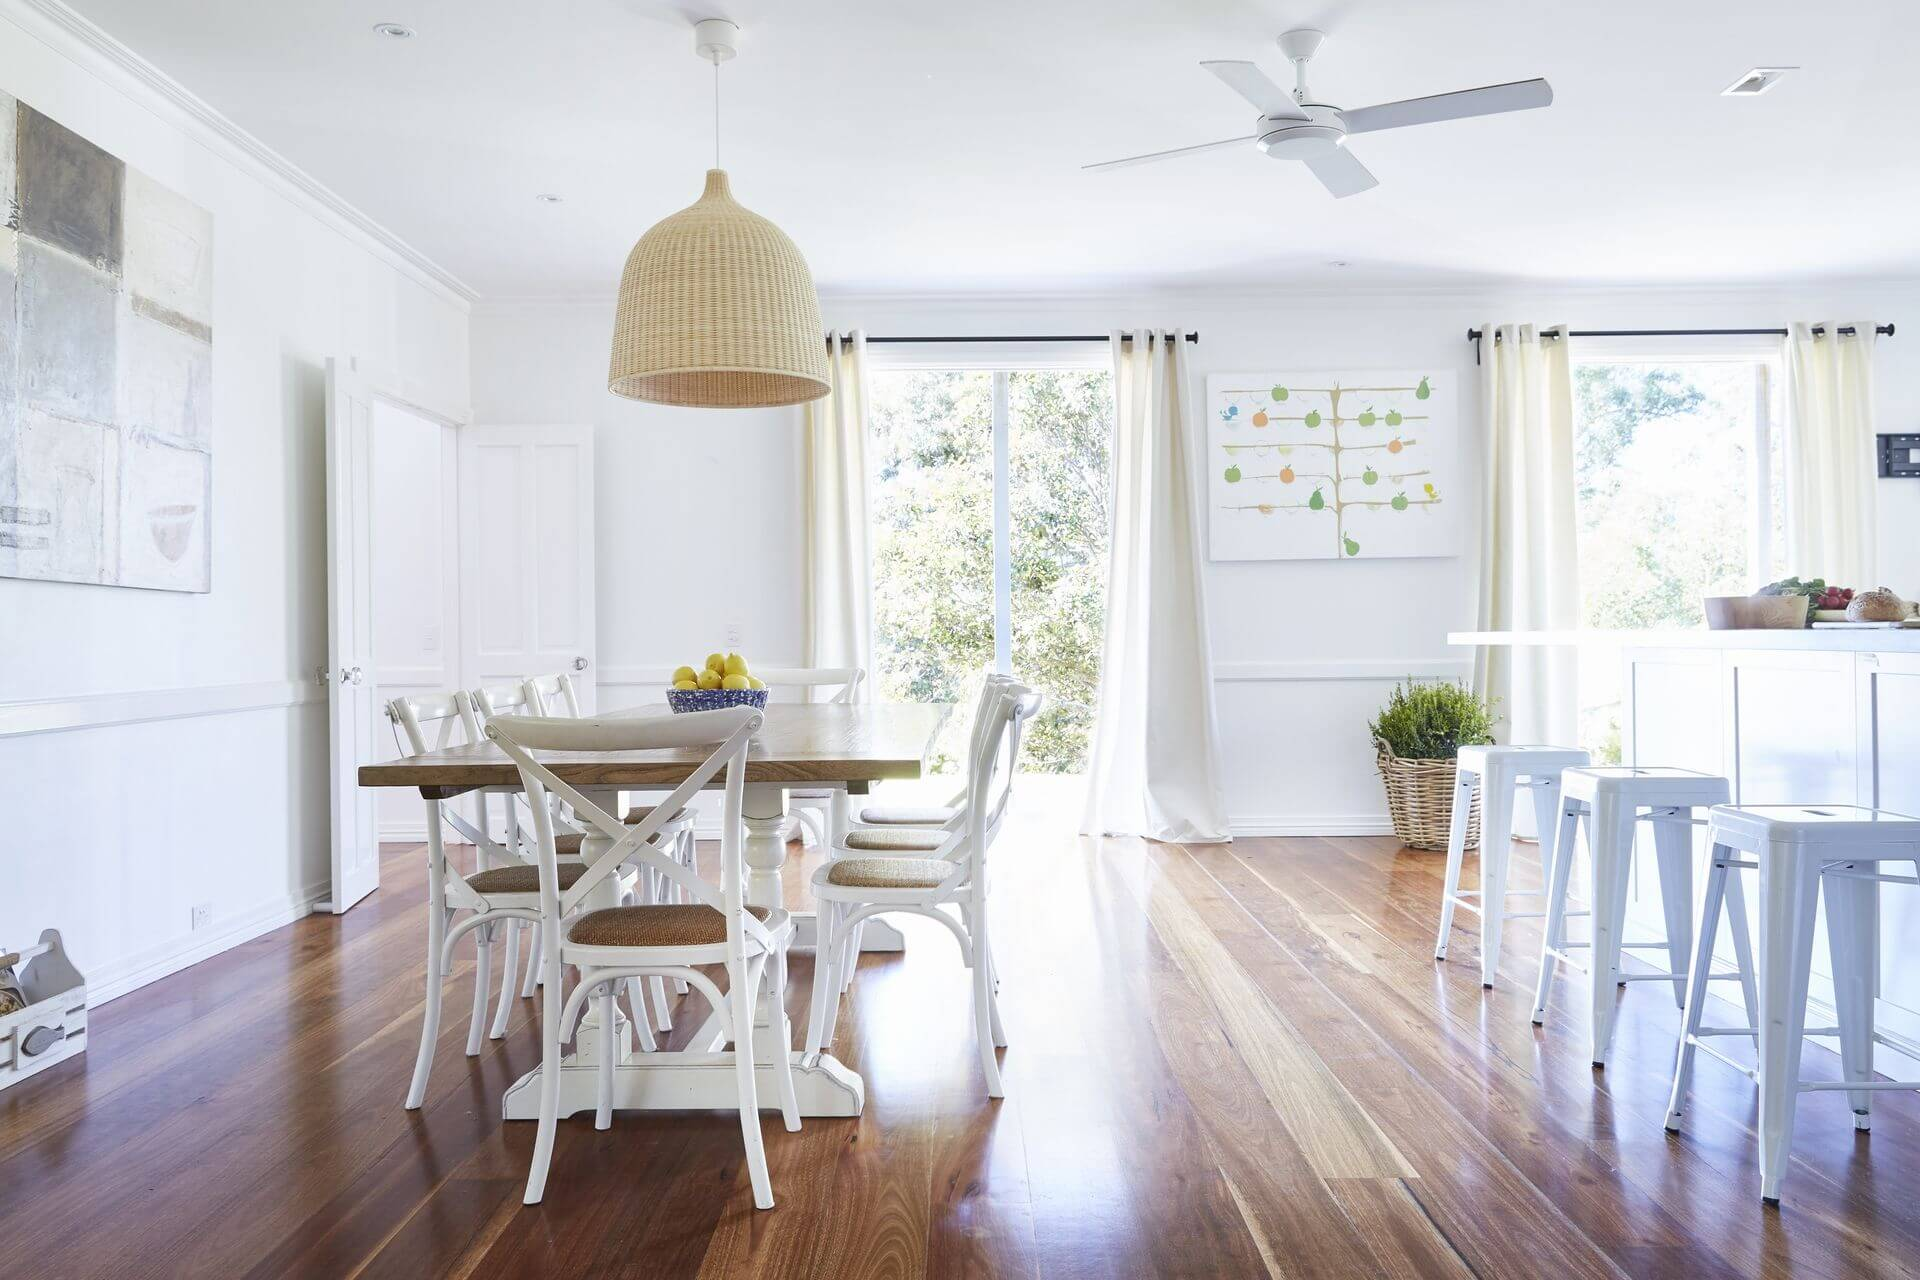 Kitchen dining openplan